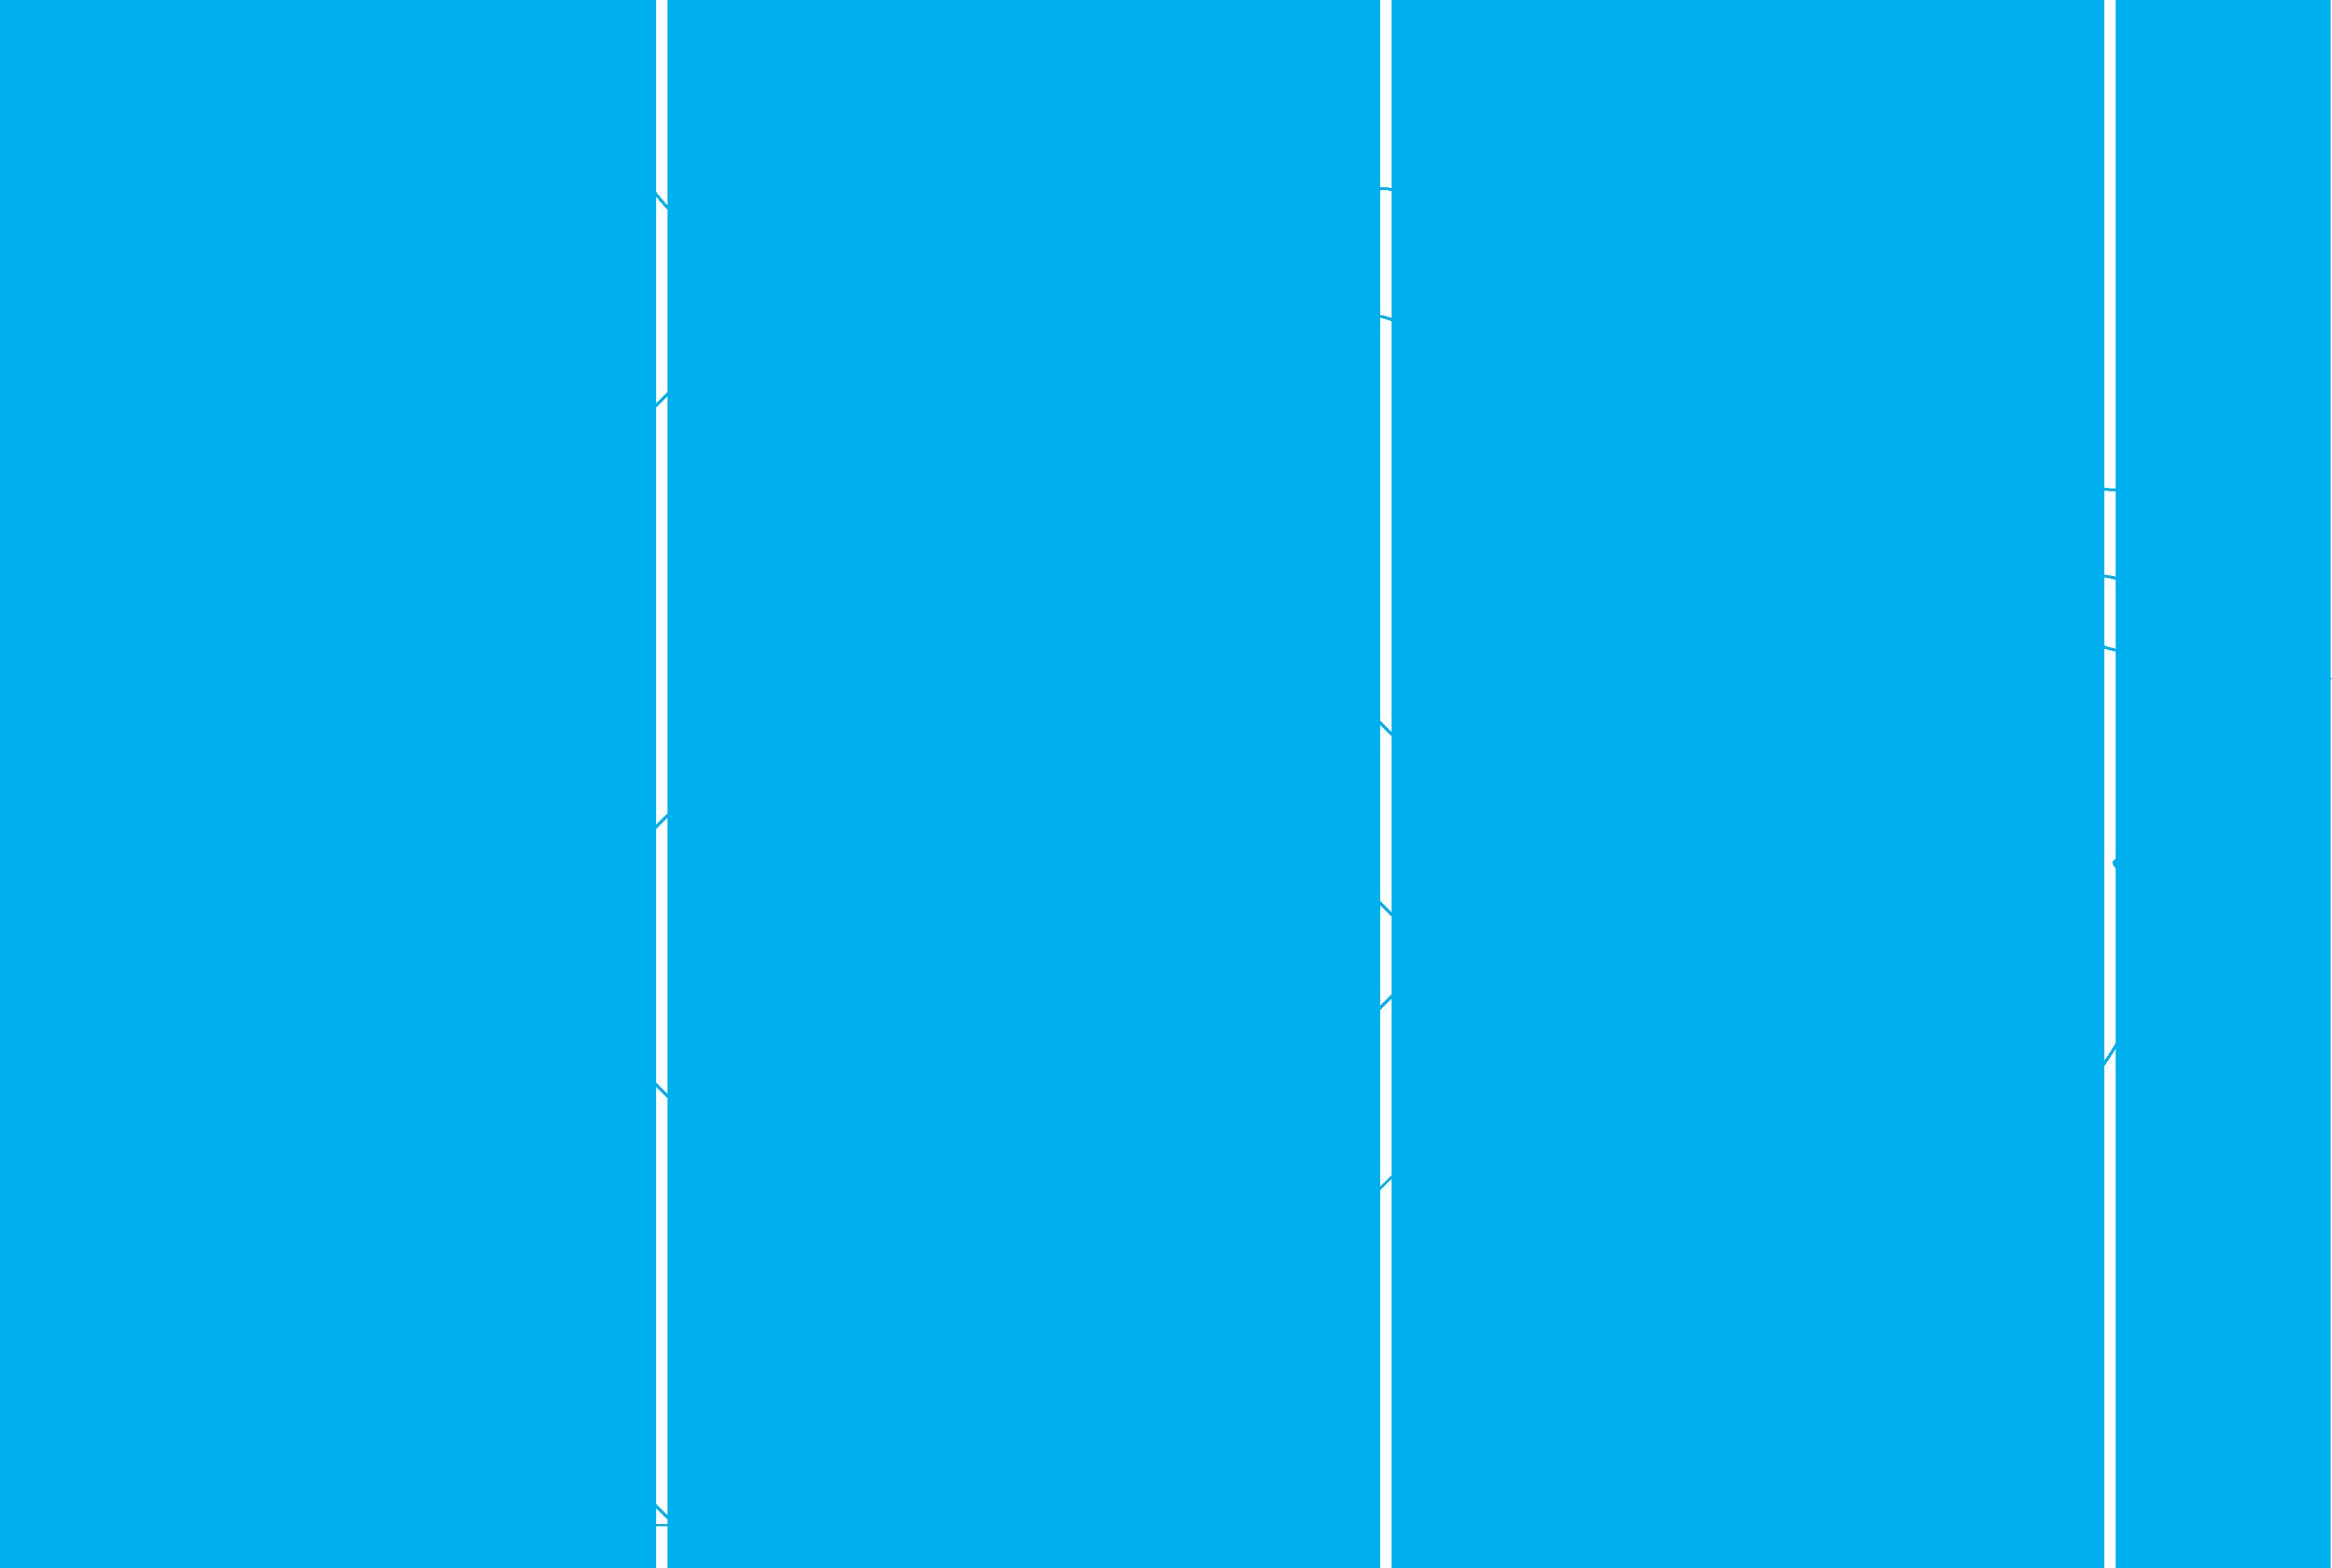 logo for background 2